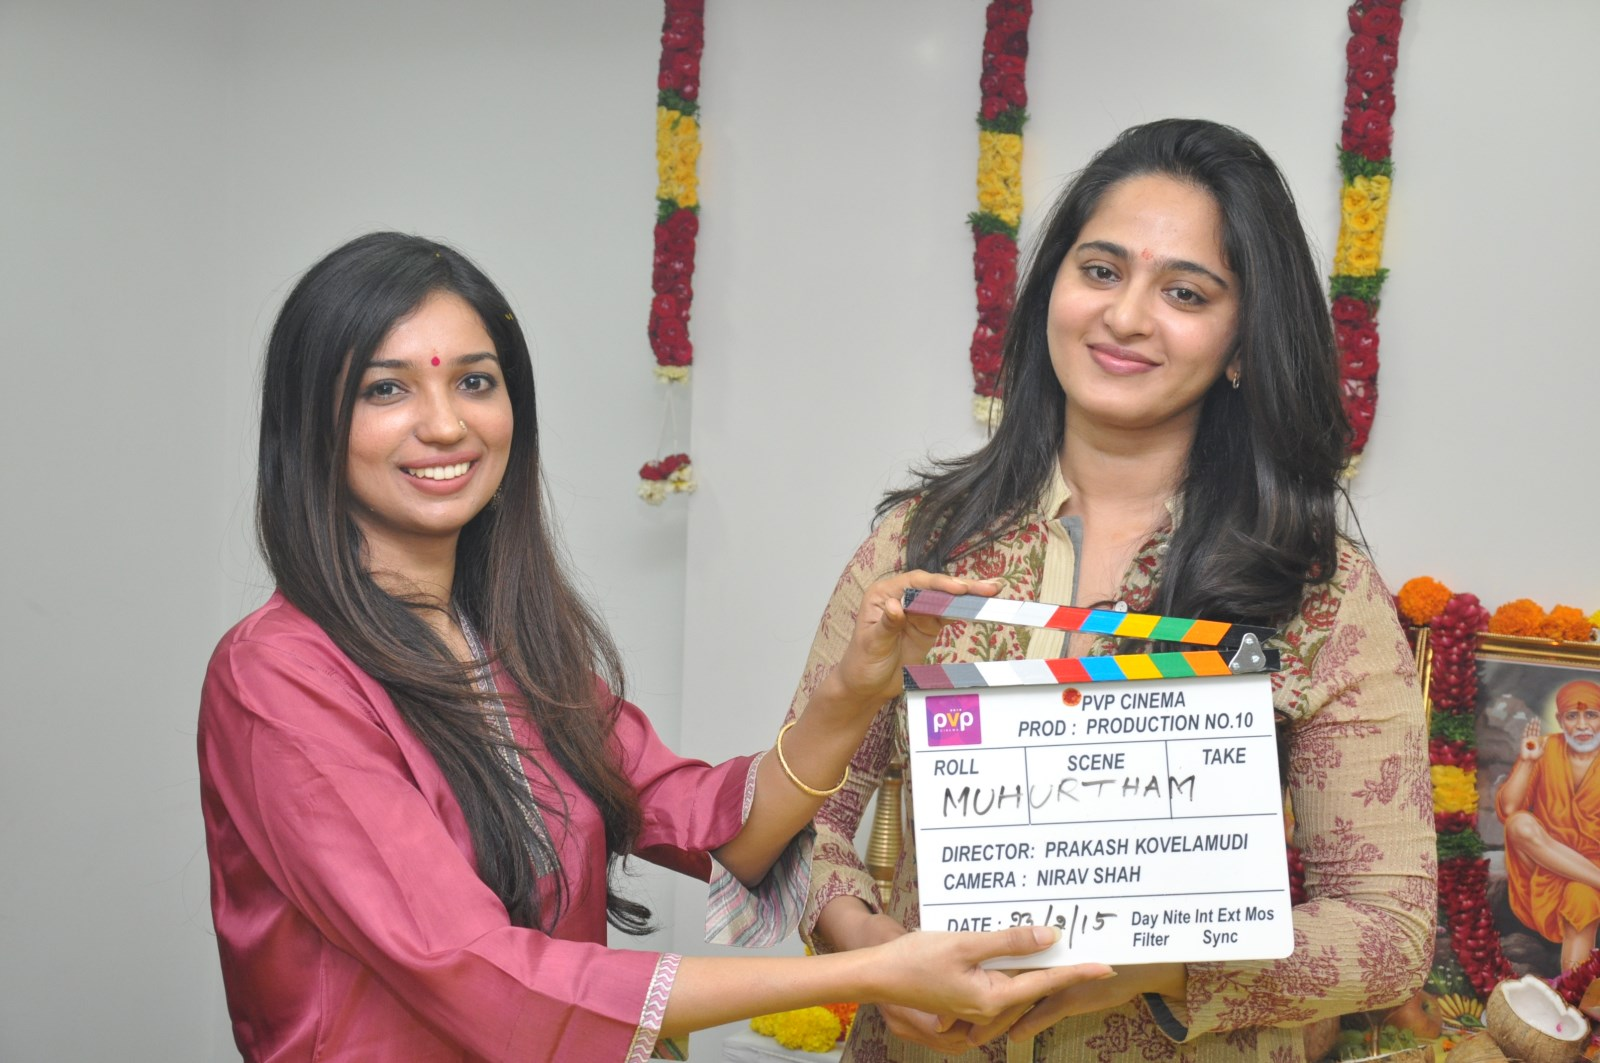 Kanika Dhillon Kovelamud, Anushka @ Size Zero Movie Launch Photos